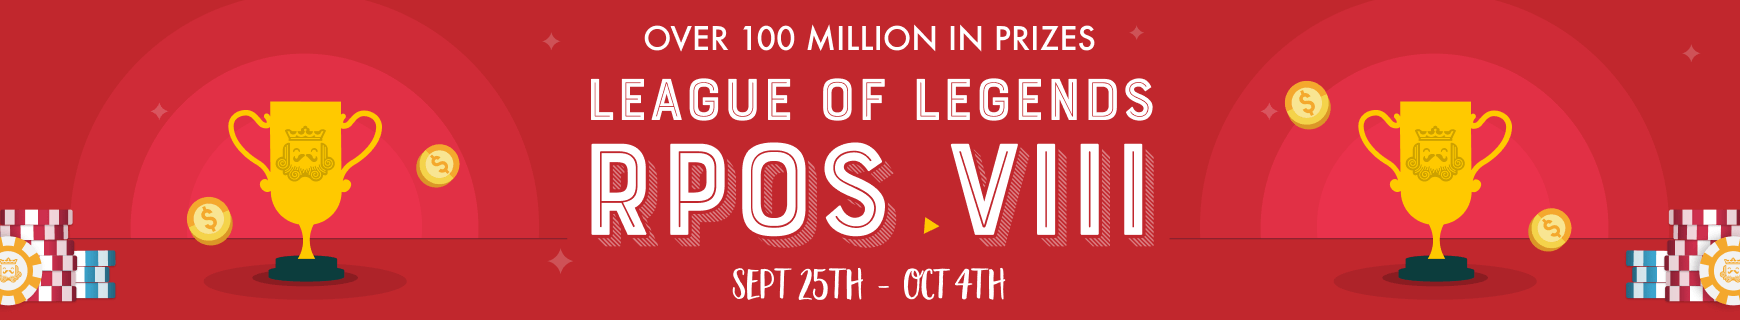 Rpos viii   league of legends   870x160 %28promotion page%29 2x